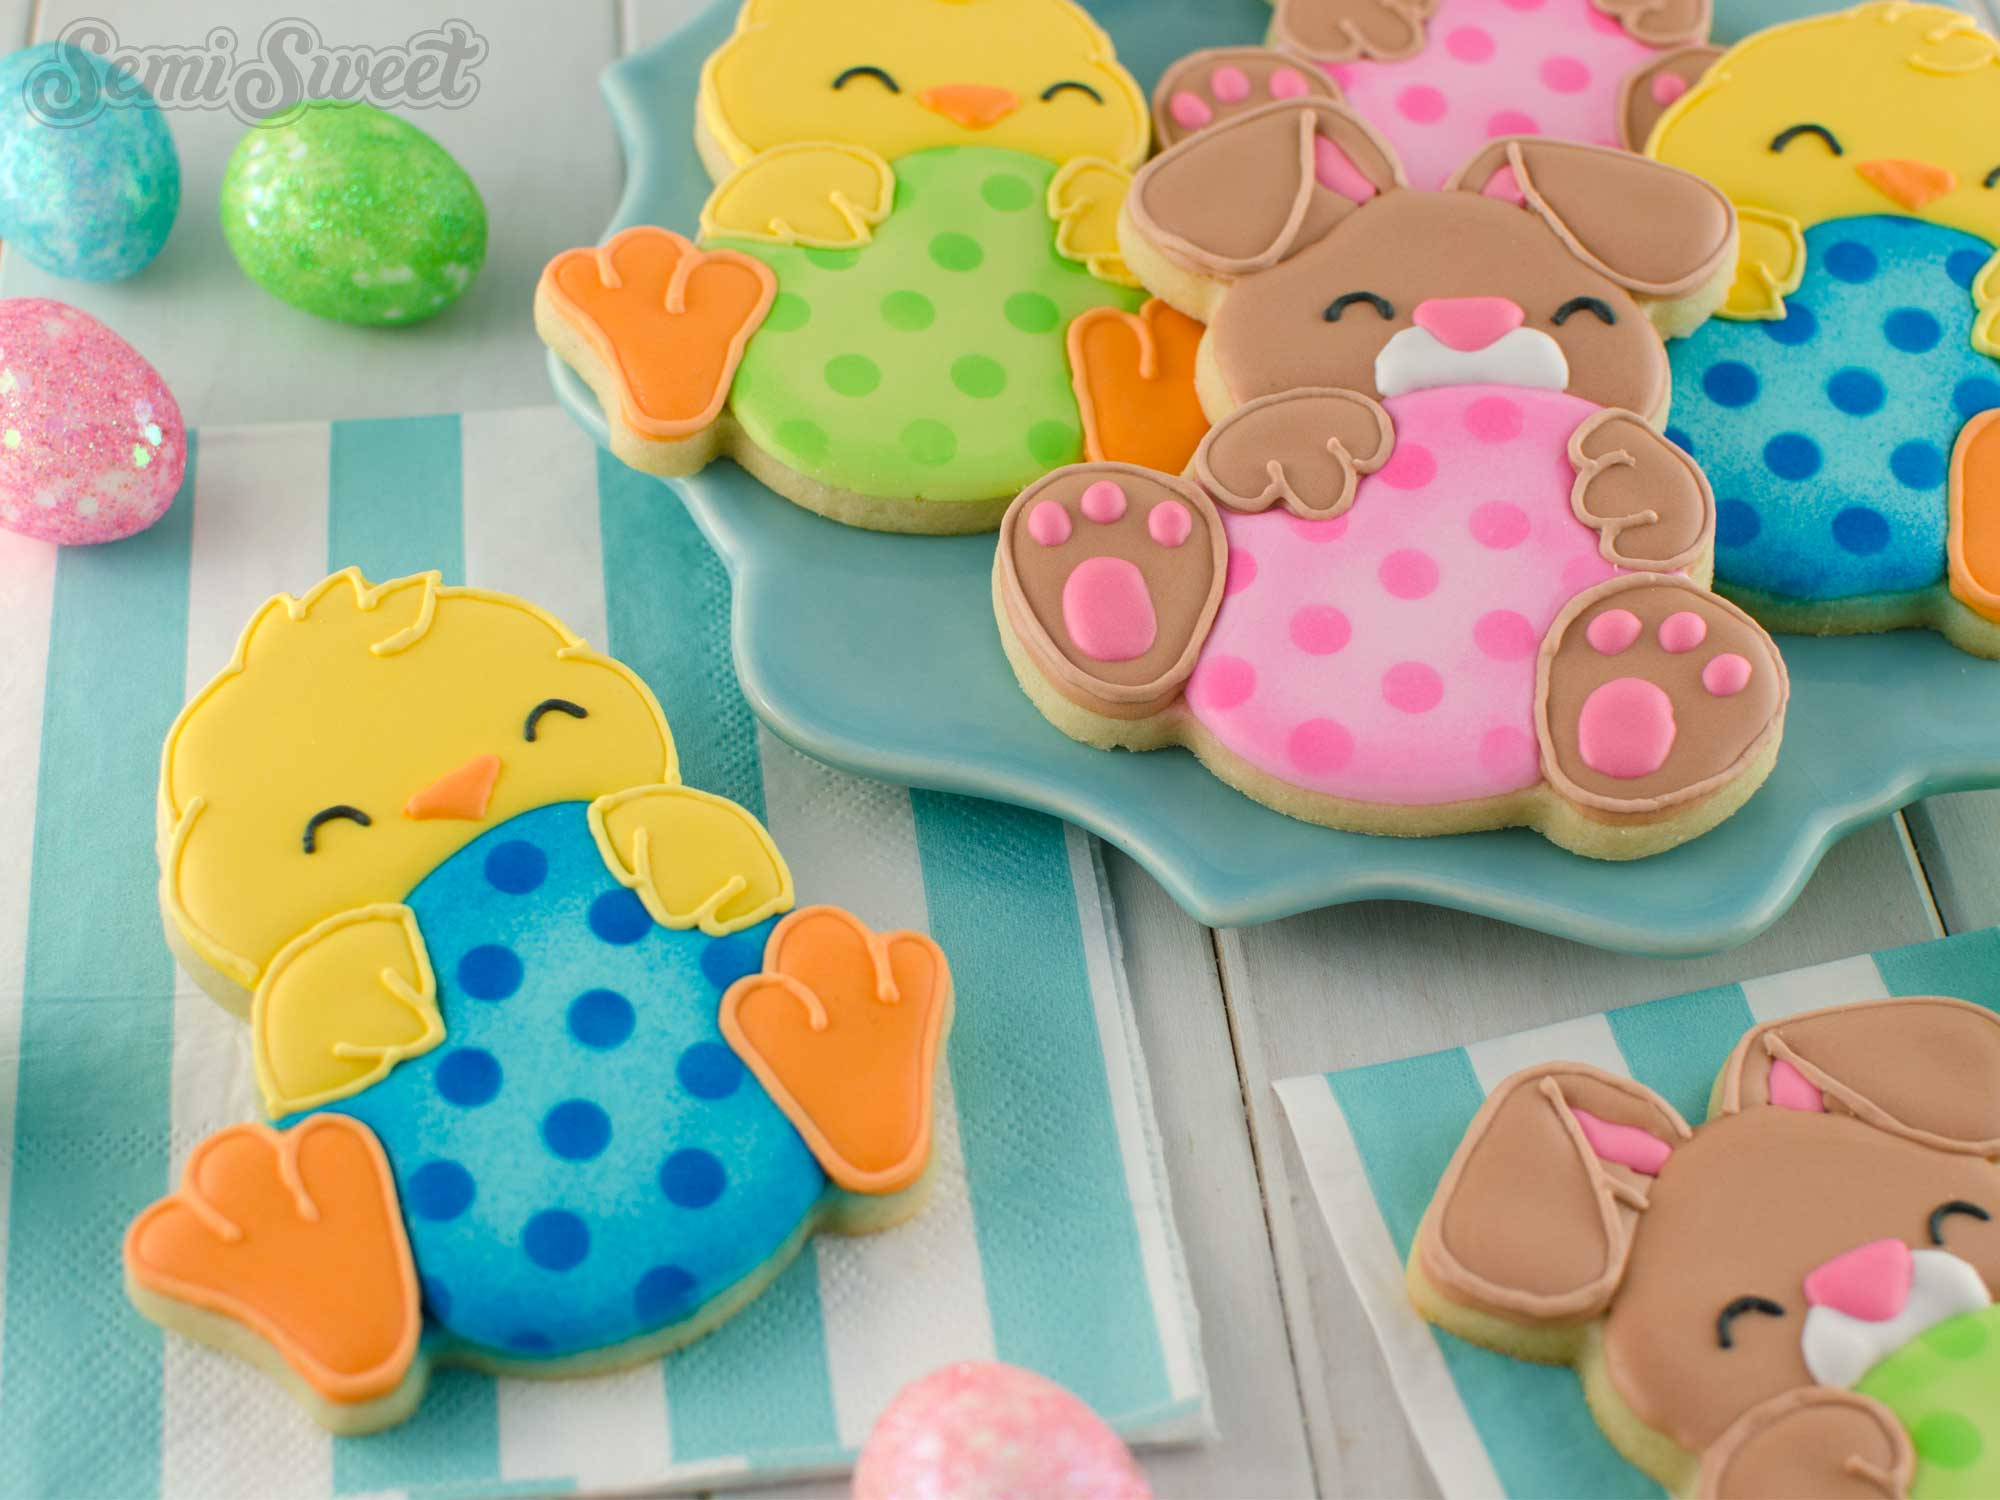 How to Make Egg Hugger Cookies